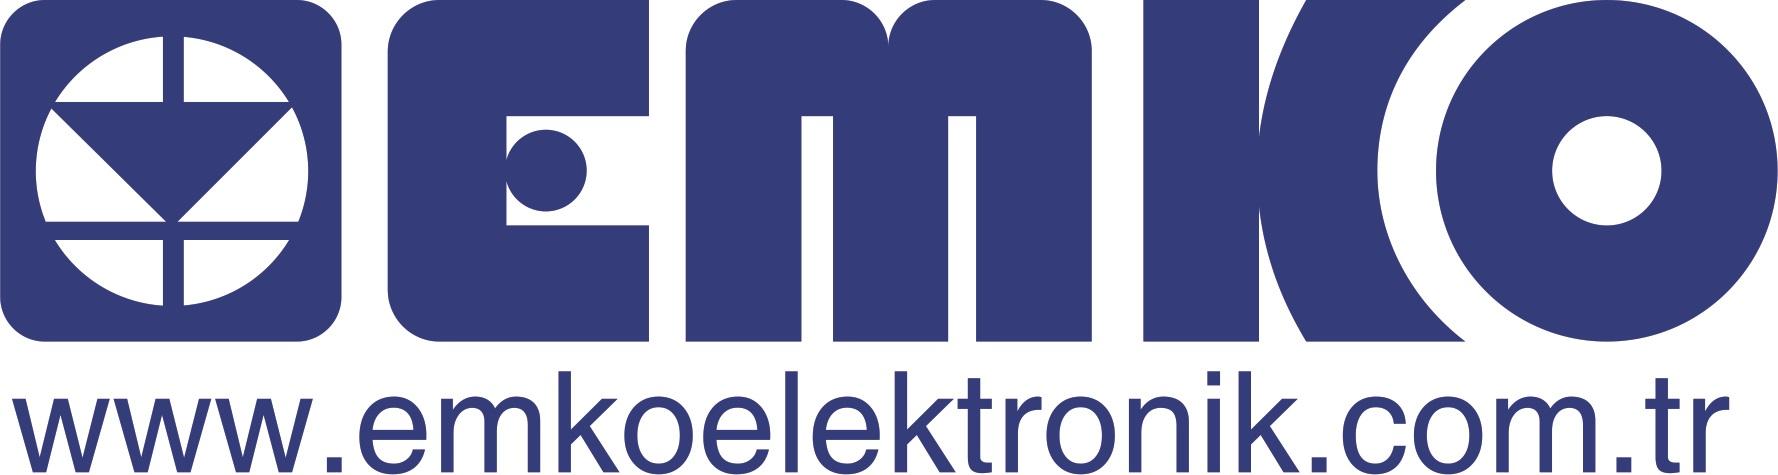 Emko Elektronik Sanayi ve Ticaret A.Ş., EMKO Elektronik